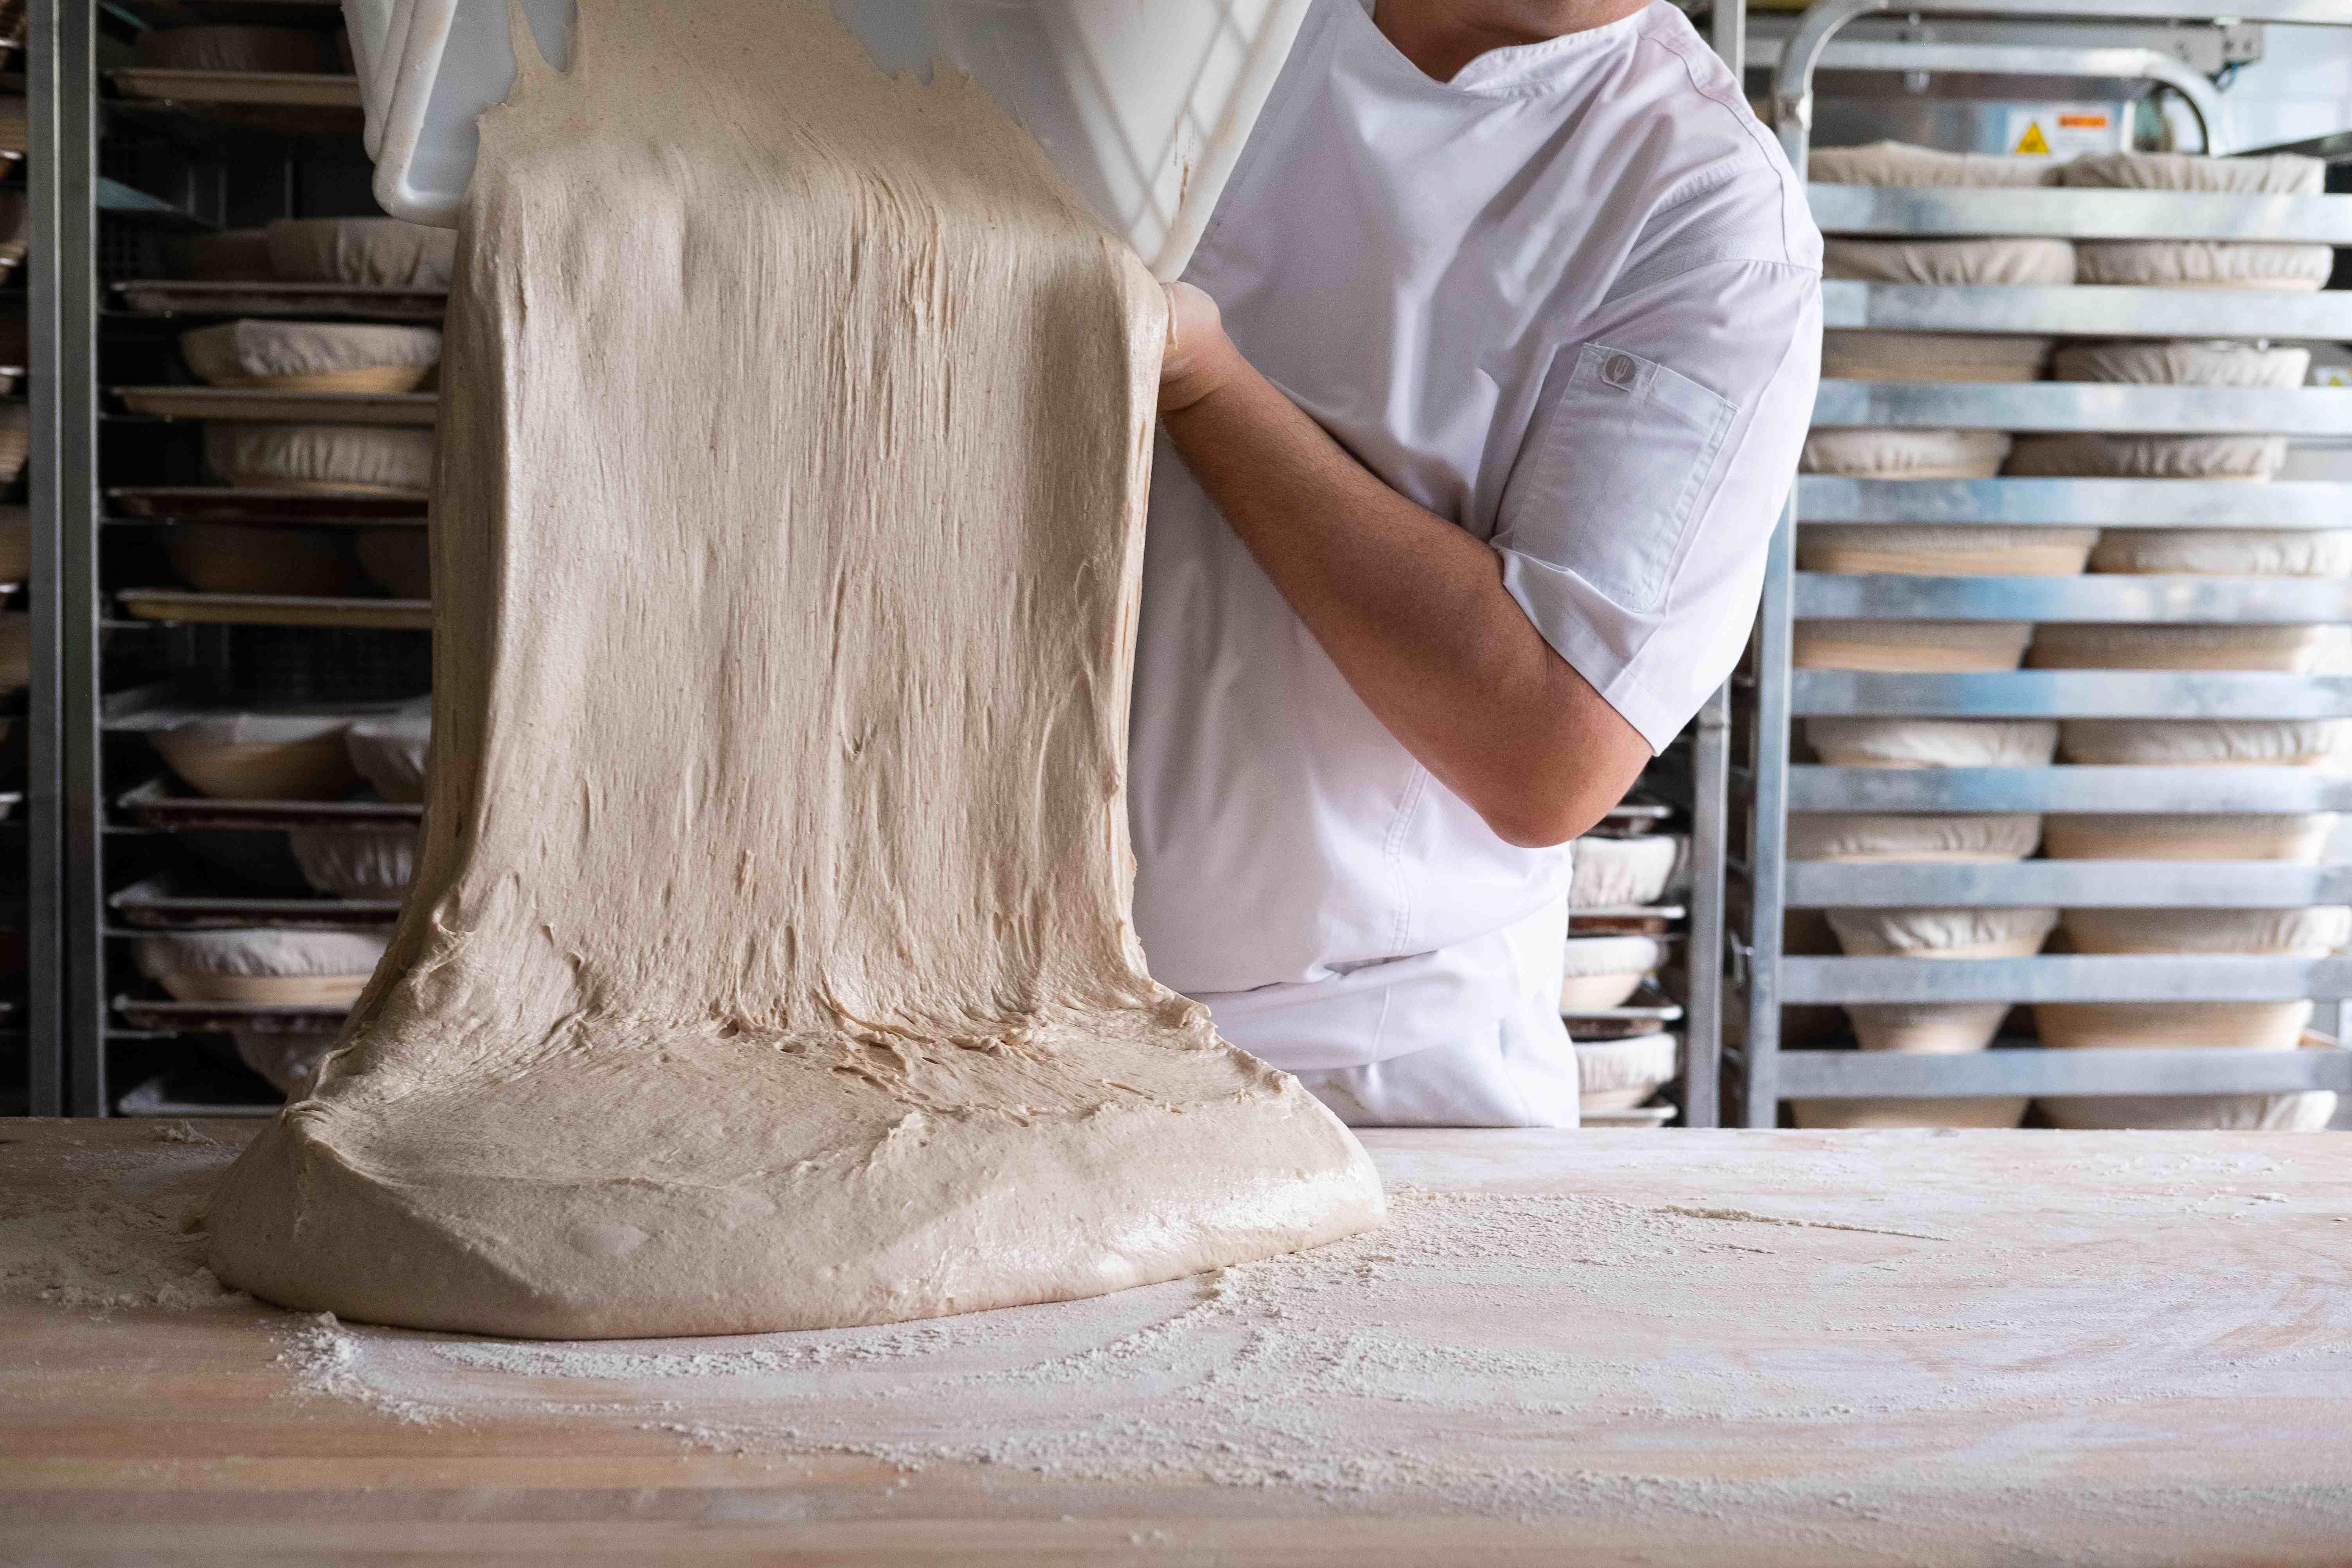 Grégoire Michaud making dough